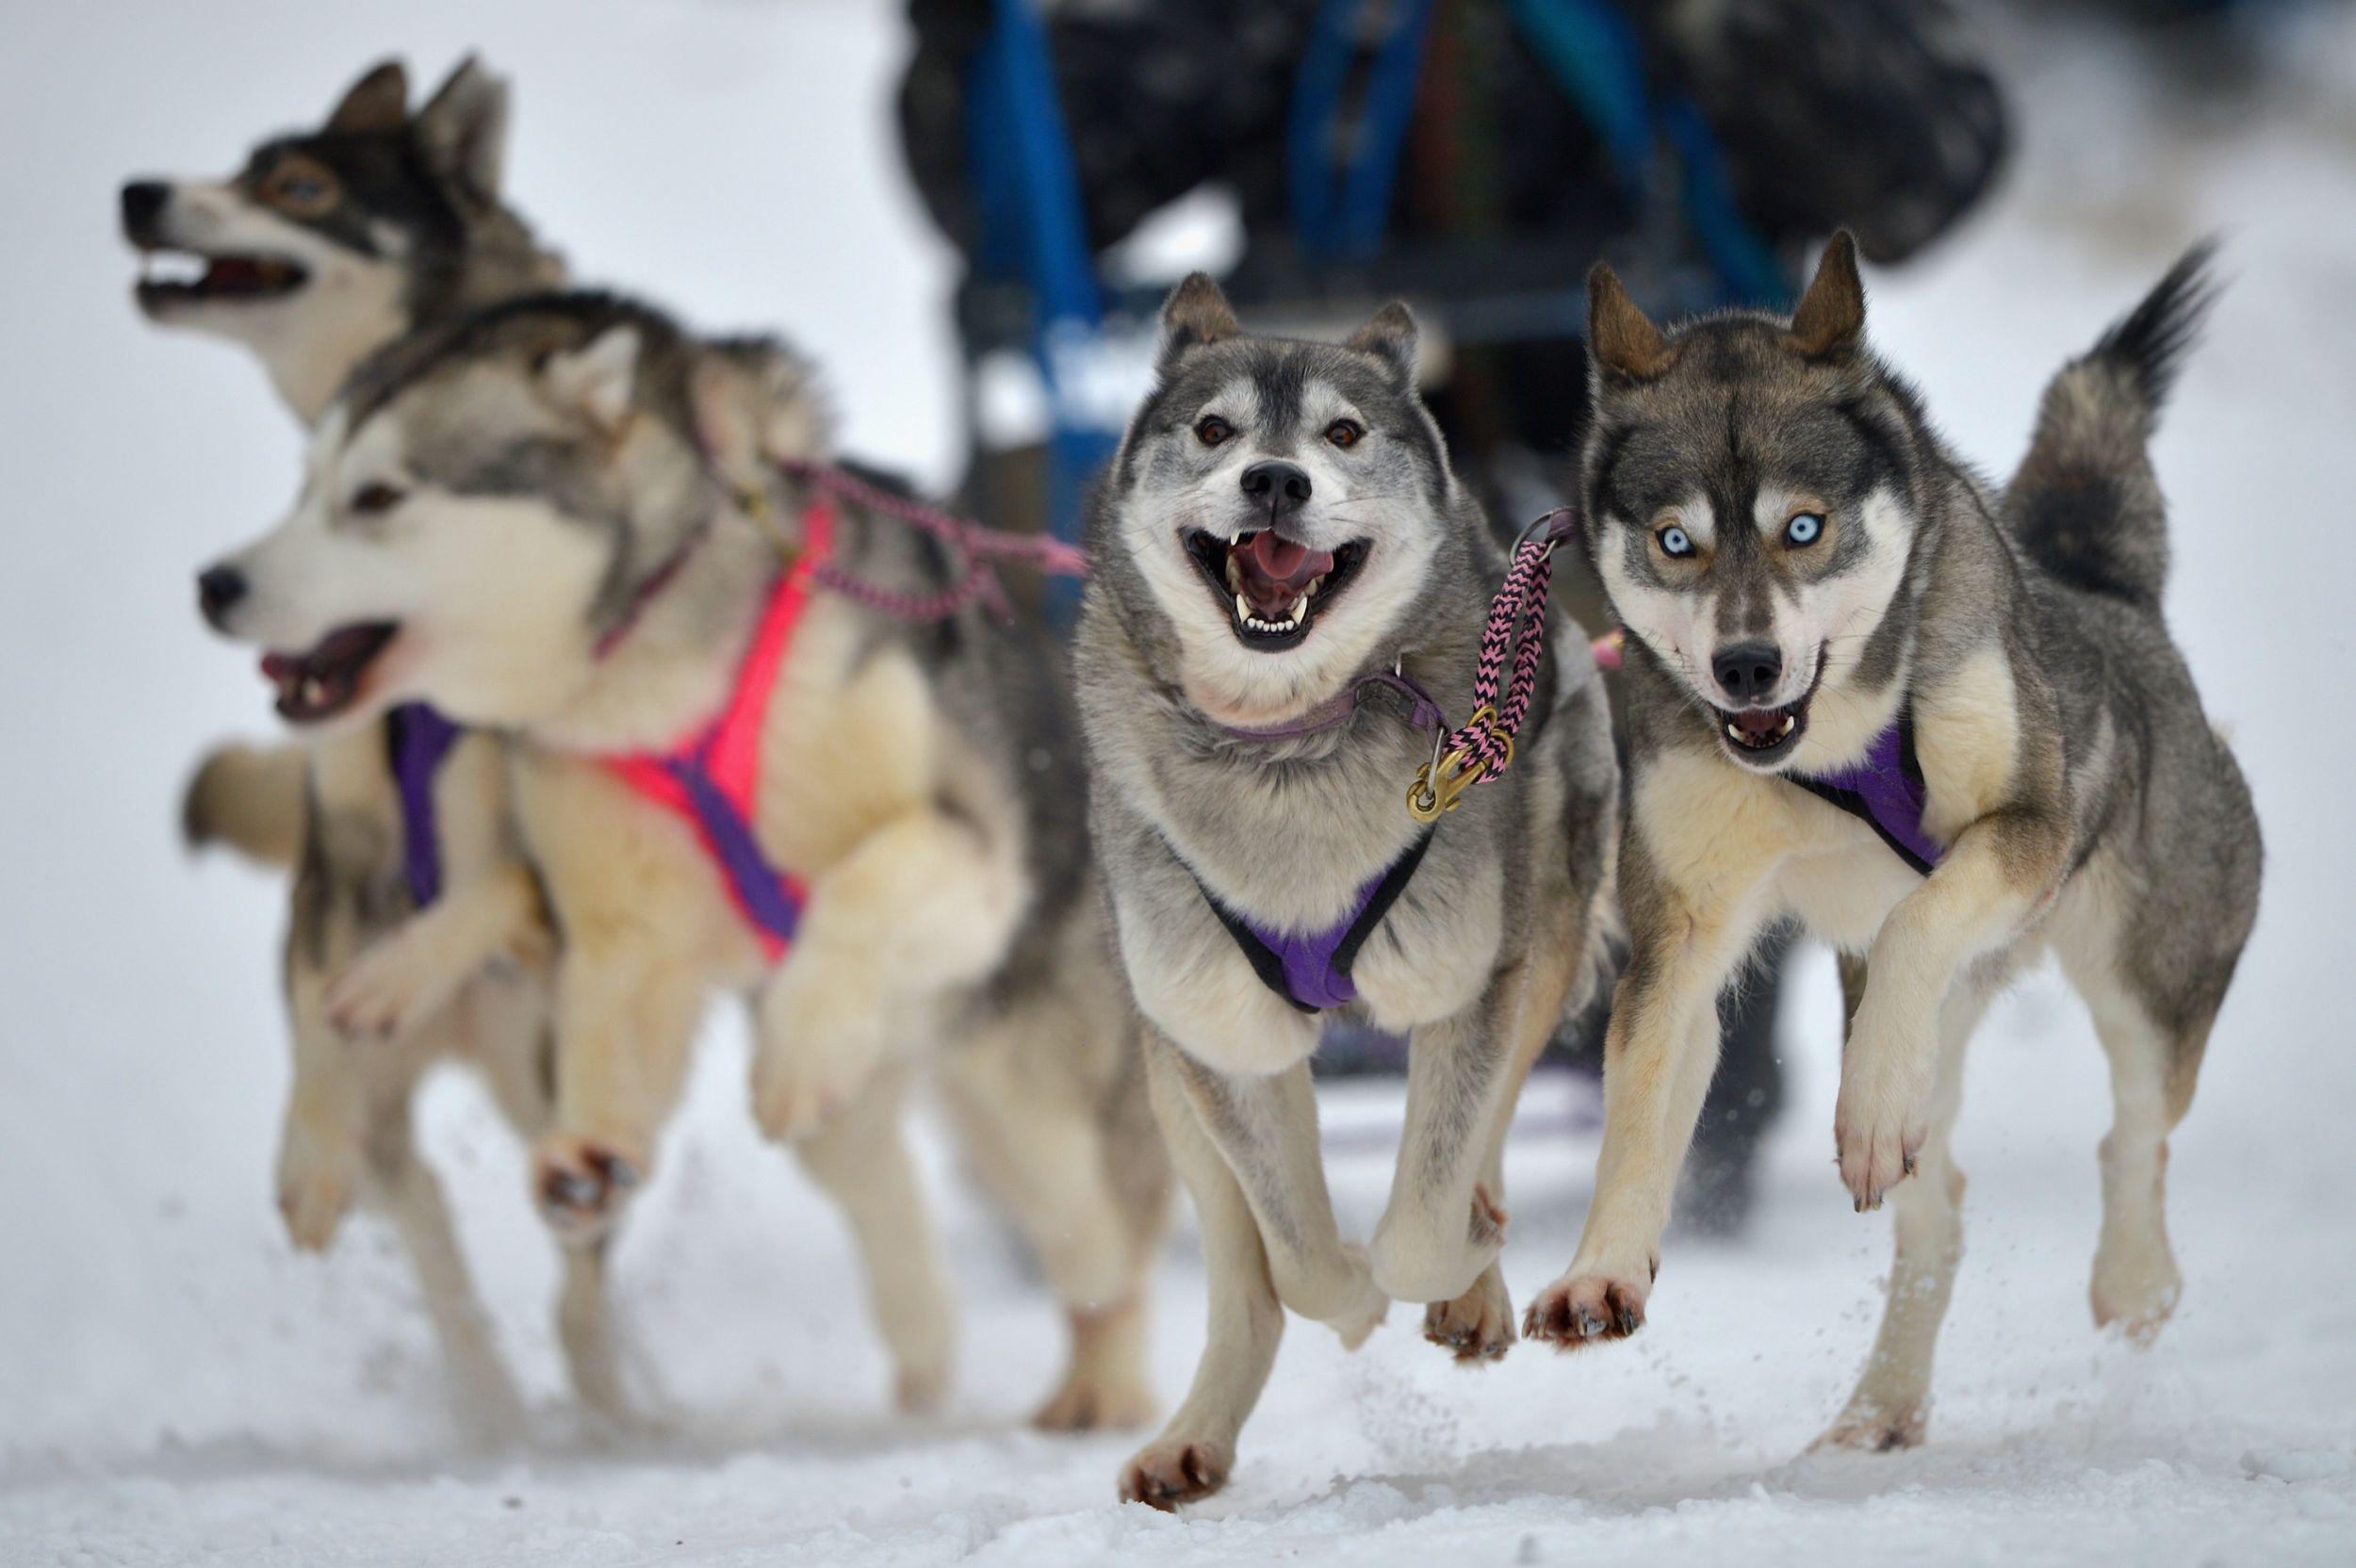 Dogilike.com :: รวมภาพน้องหมาลากเลื่อนสุดเท่